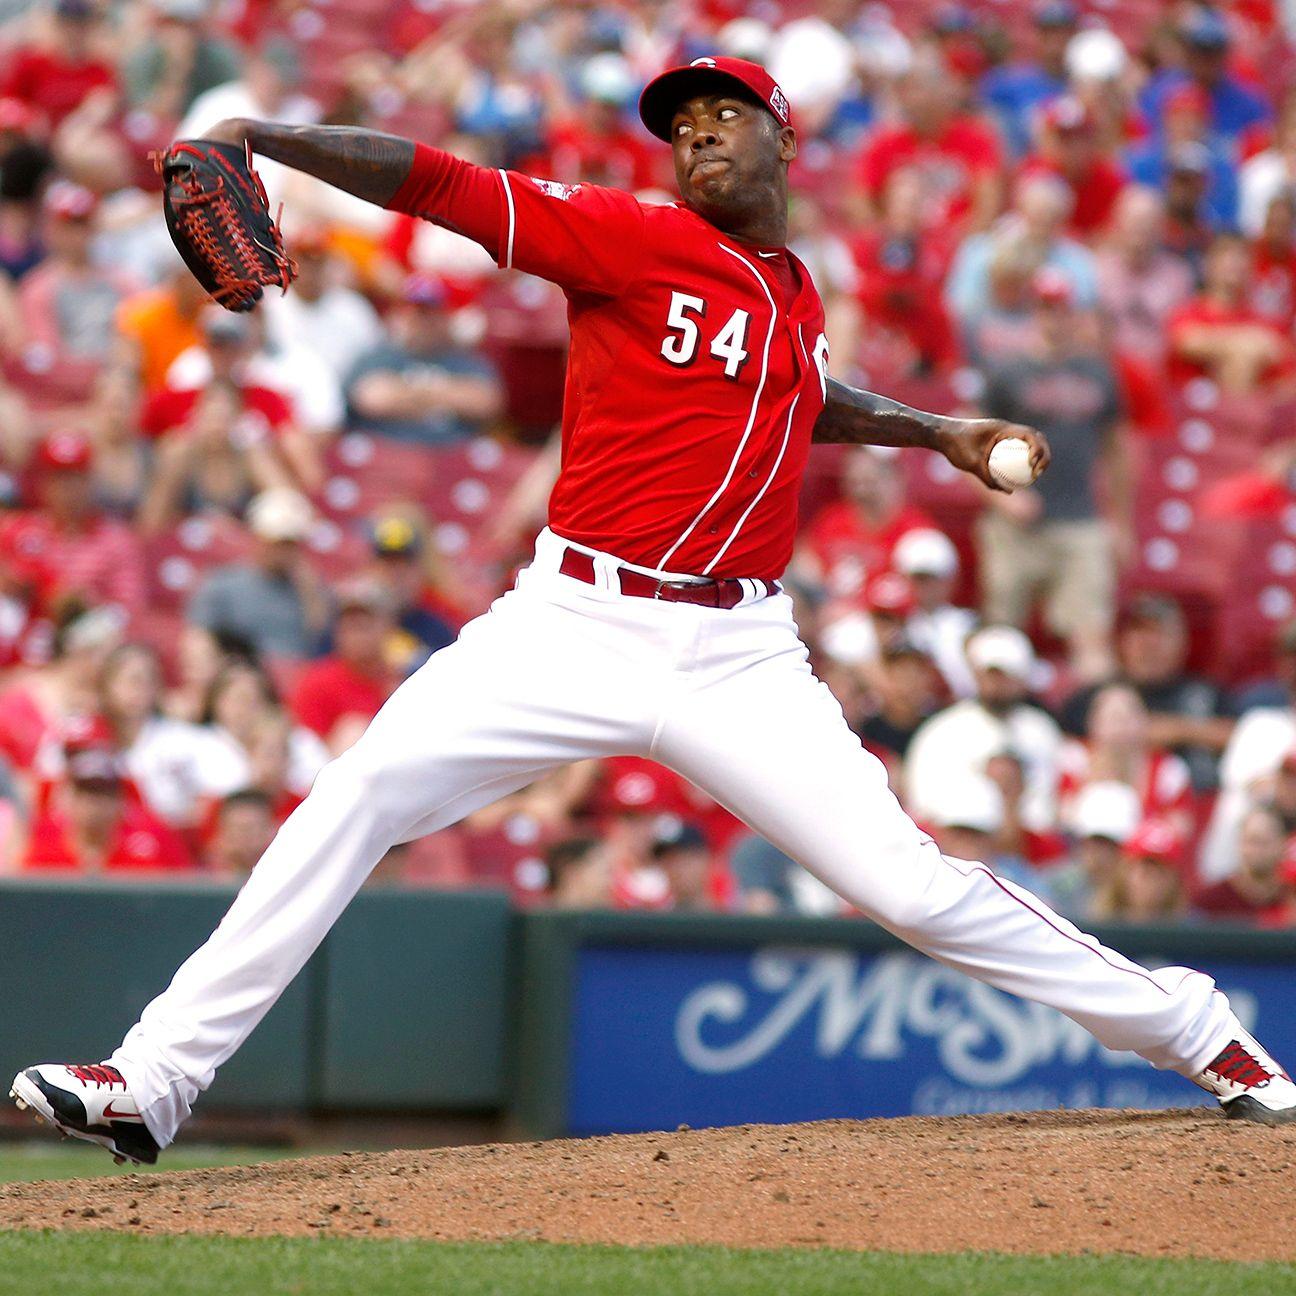 Trade idea: Aroldis Chapman to the Yankees